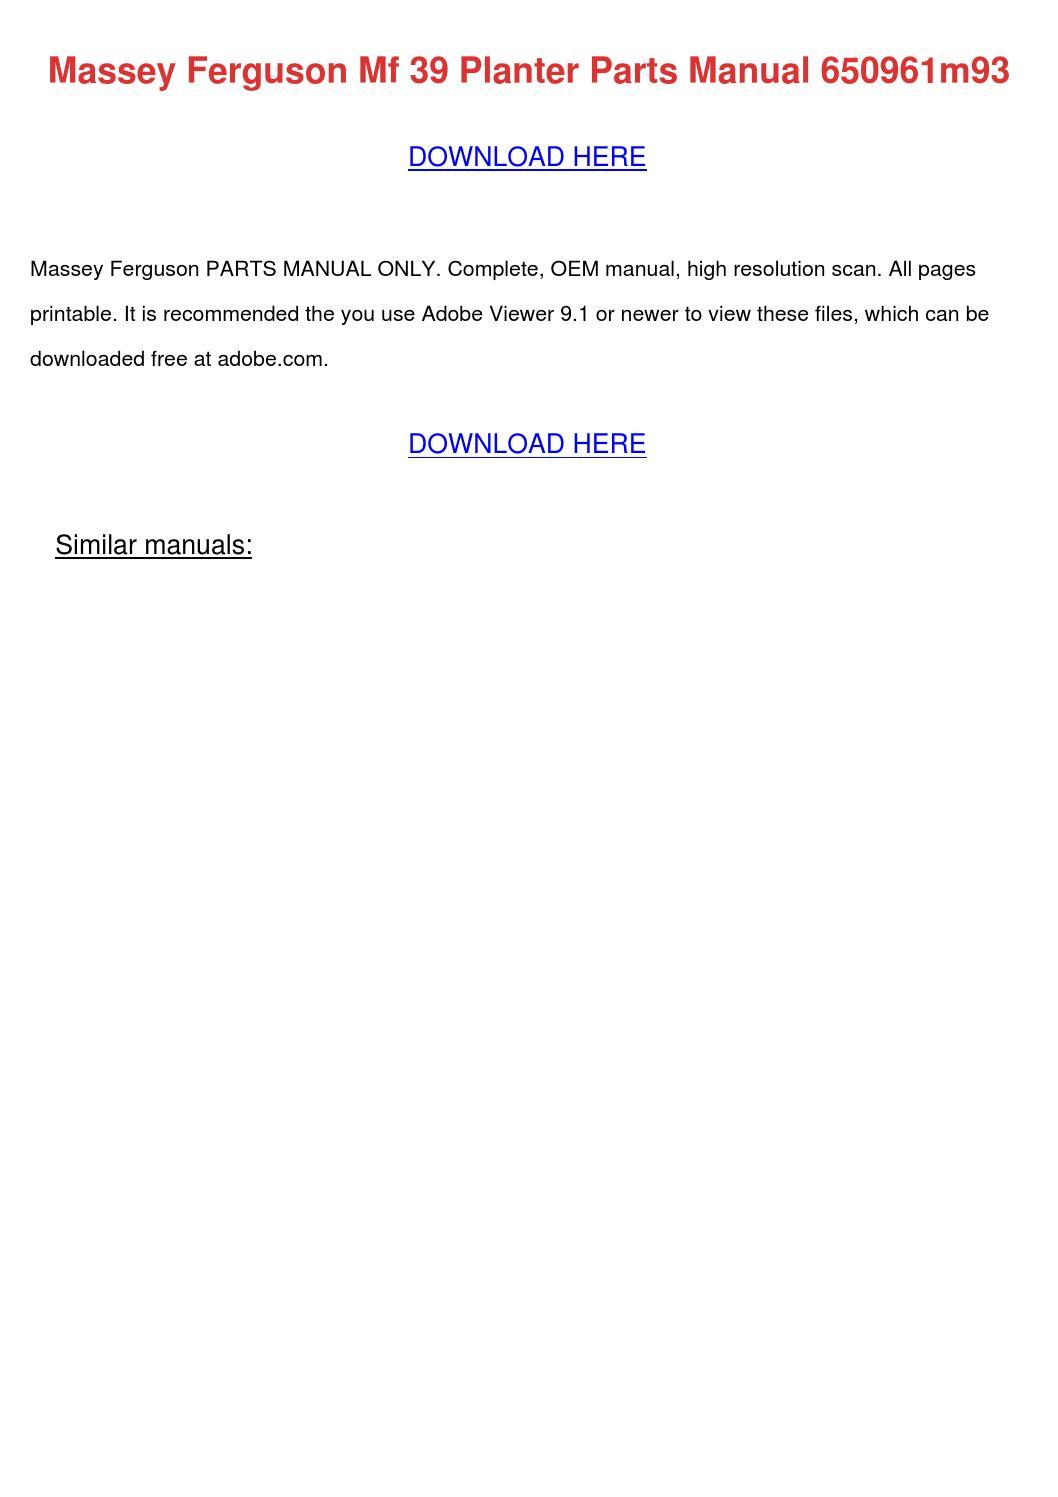 Massey Ferguson Mf 39 Planter Parts Manual 65 by GilbertFisher - issuu